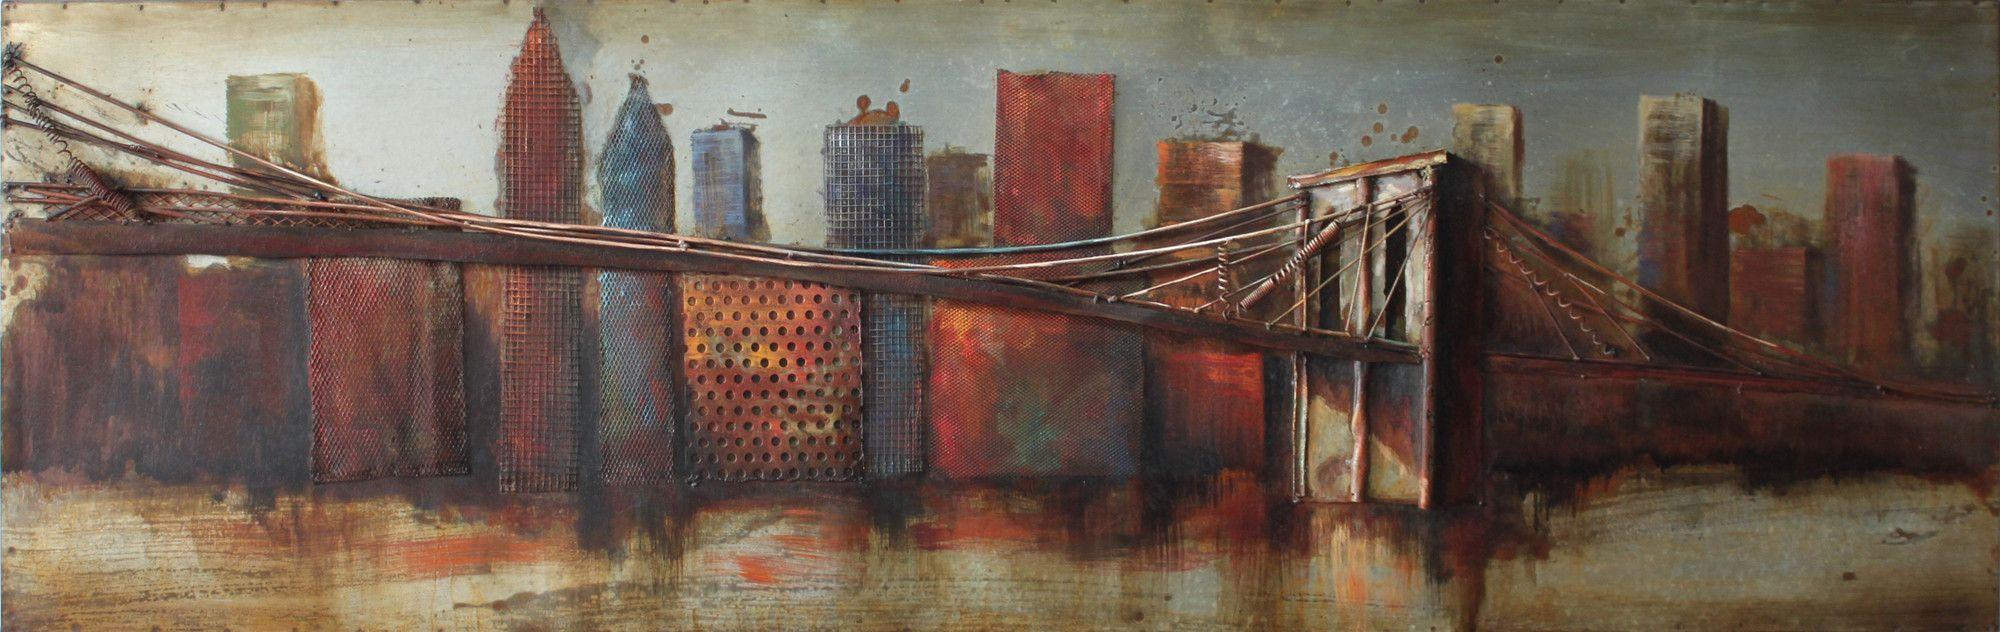 """bridge To The City"" Mixed Media Iron Hand Painted Dimensional Wall Decor Regarding 2020 Bridge To The City 1 Mixed Media Iron Hand Painted Dimensional Wall (View 2 of 20)"